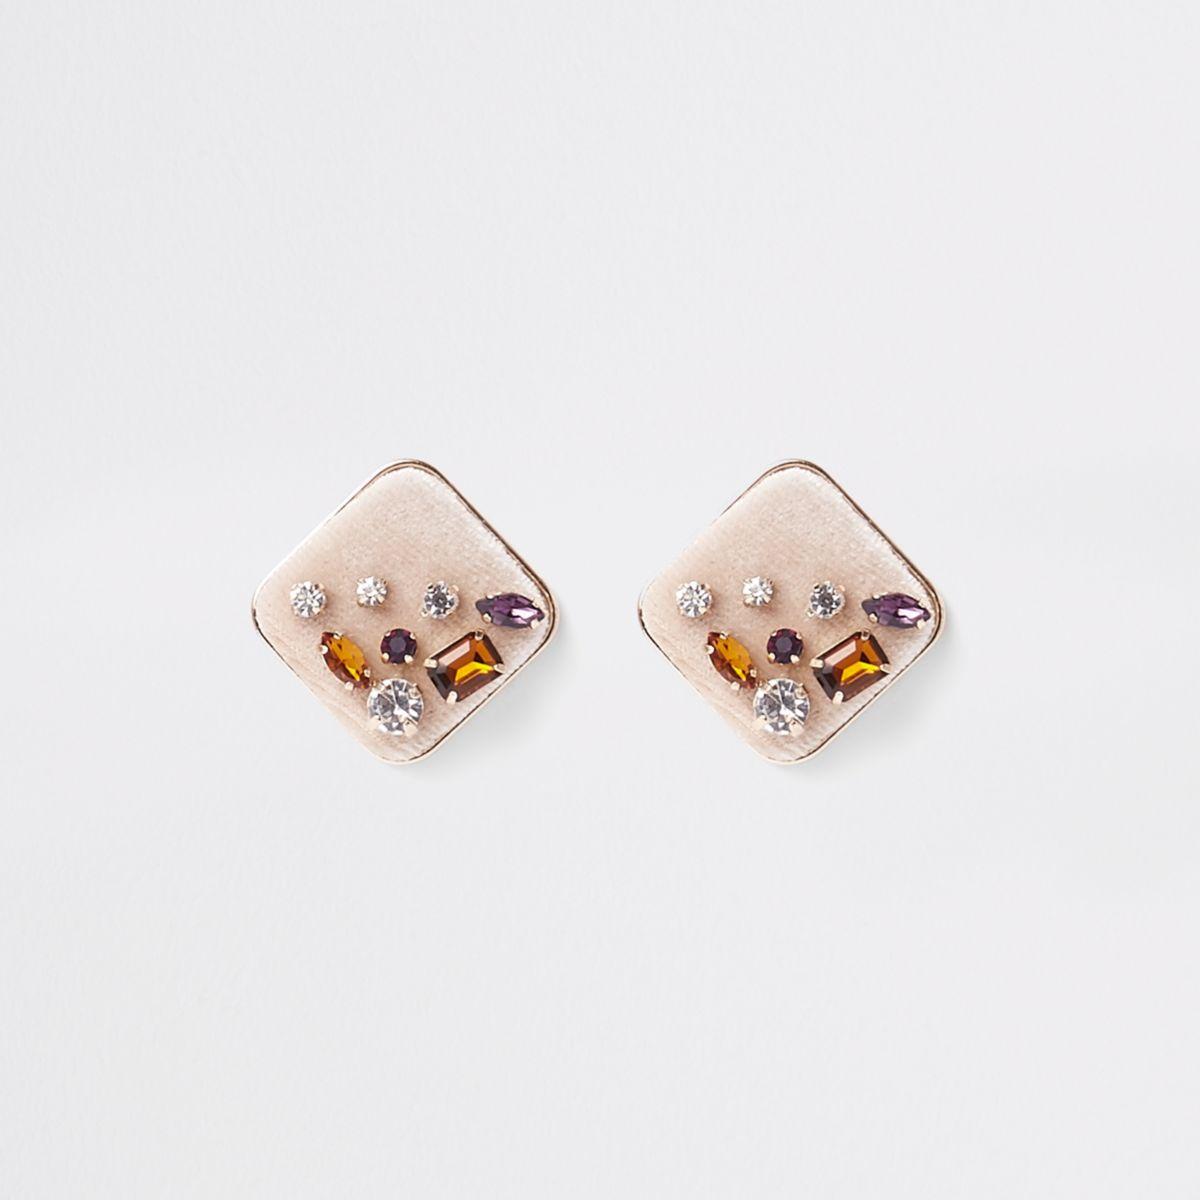 Gold tone rhinestone jewel square earrings